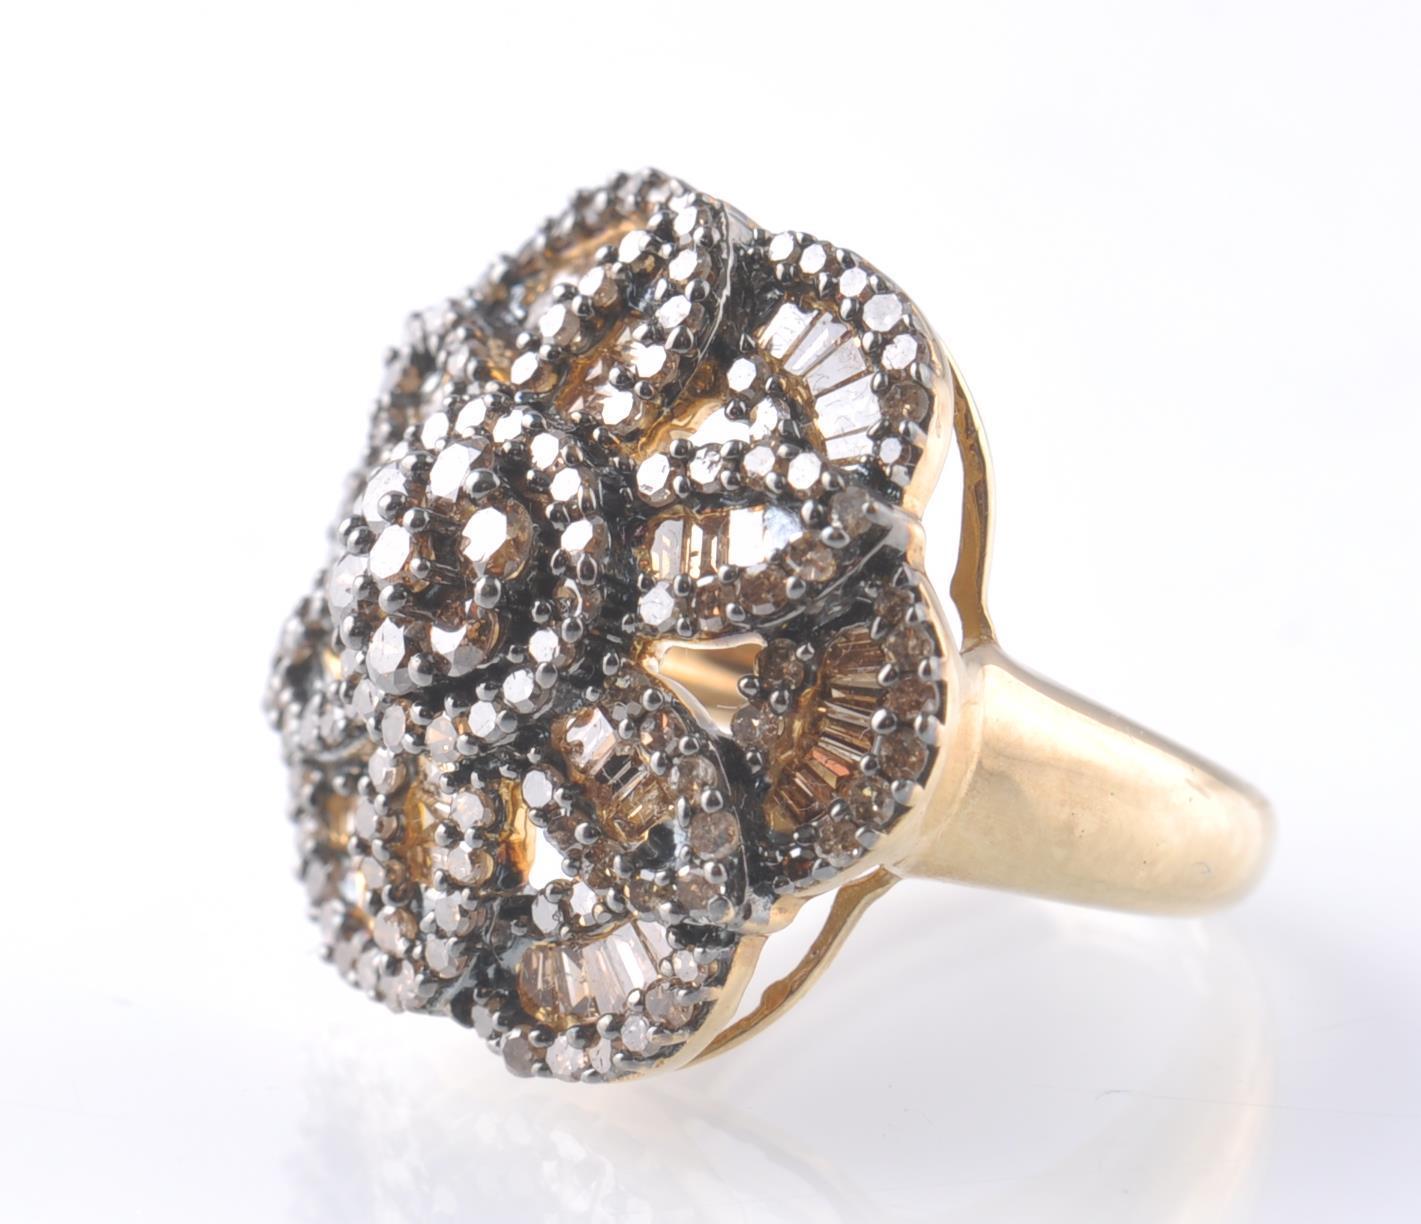 9CT GOLD BIRMINGHAM CHAMPAGNE DIAMOND FLOWER CLUST - Image 2 of 4